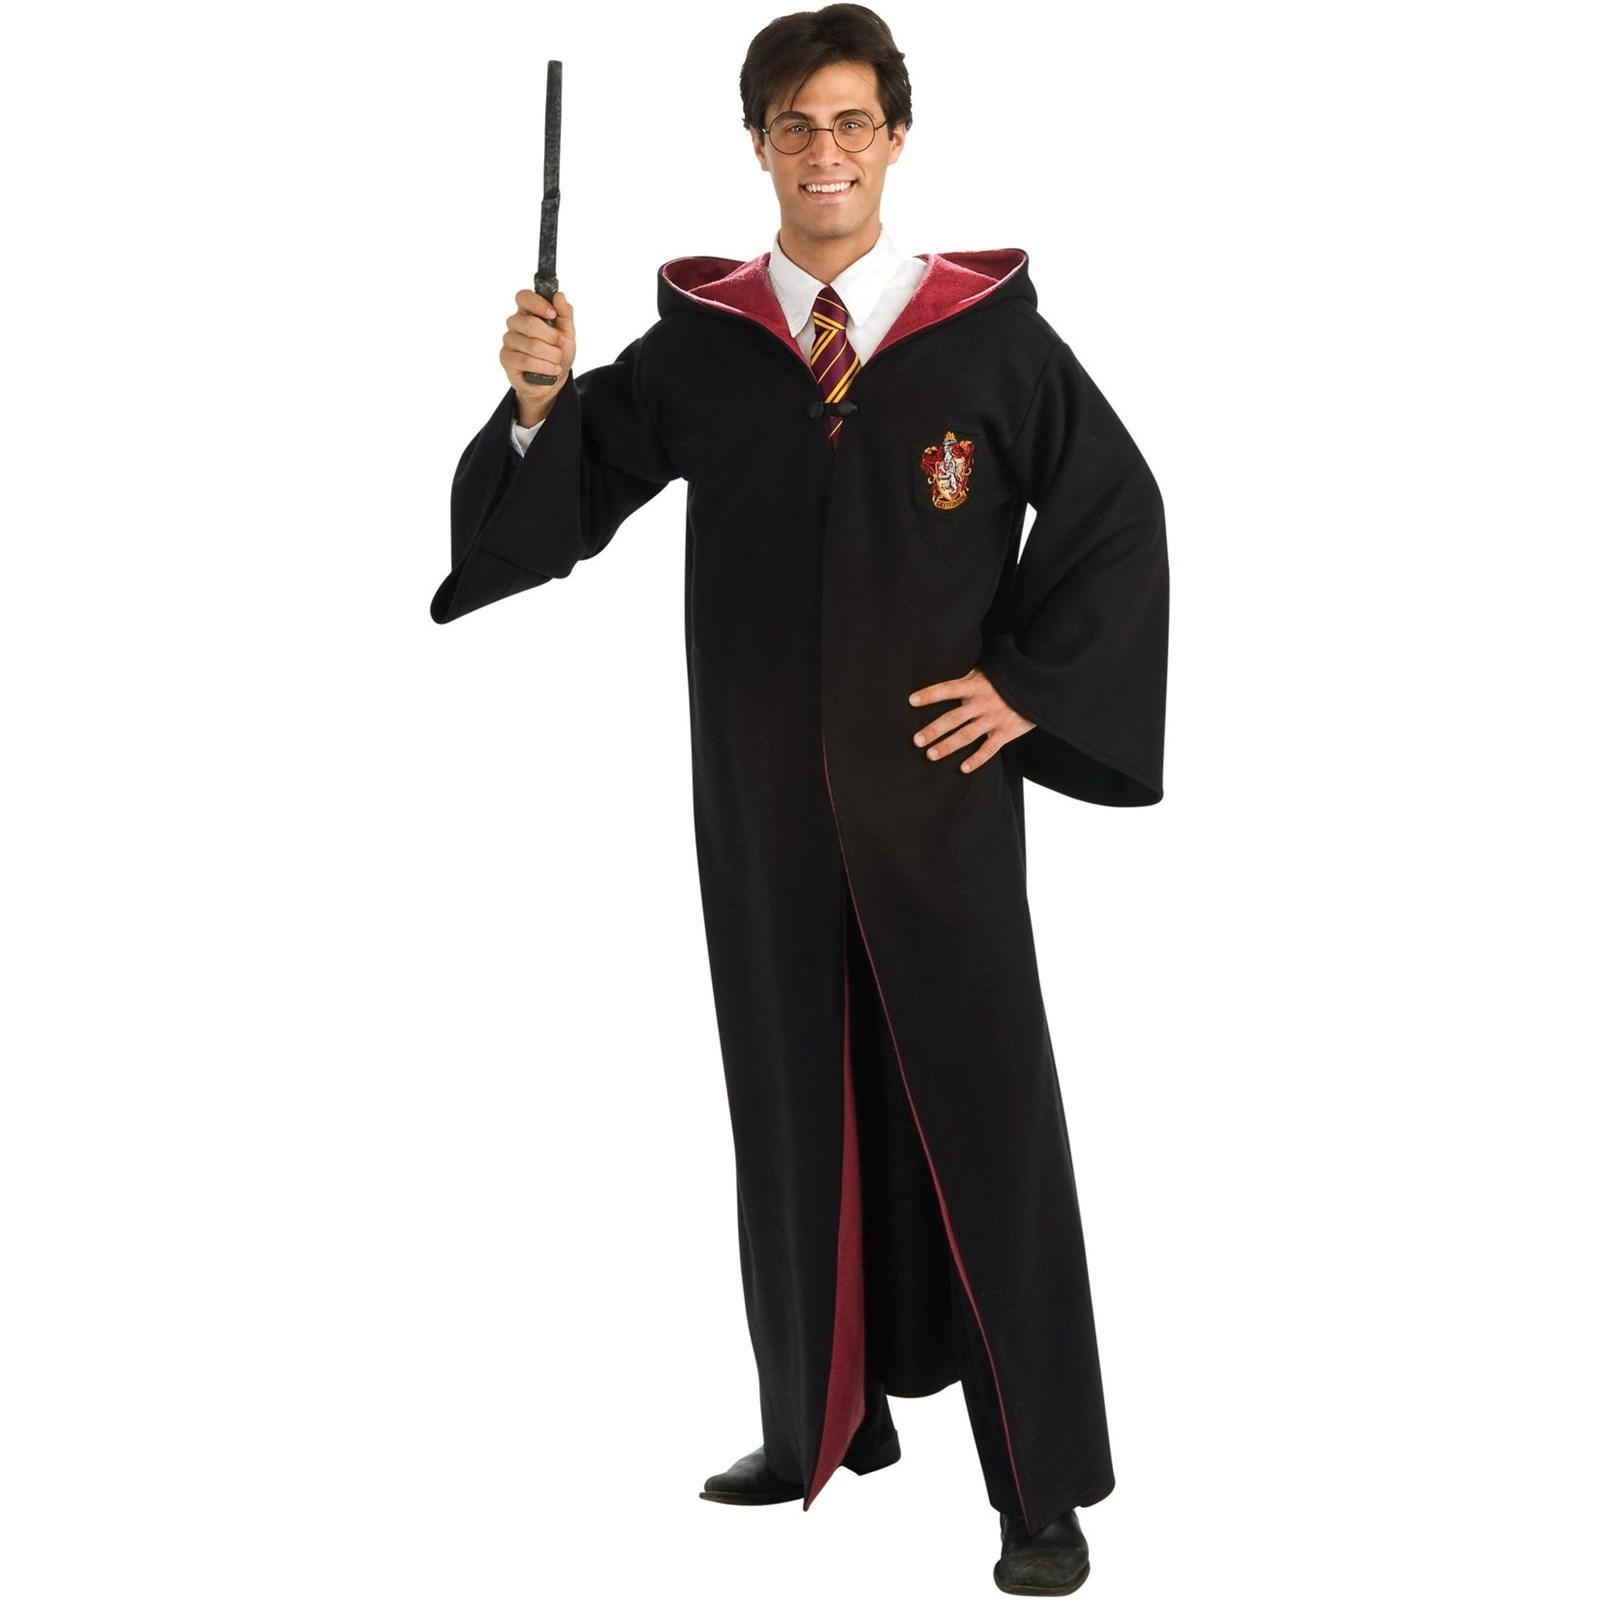 harry potter deluxe robe adult costume. Black Bedroom Furniture Sets. Home Design Ideas